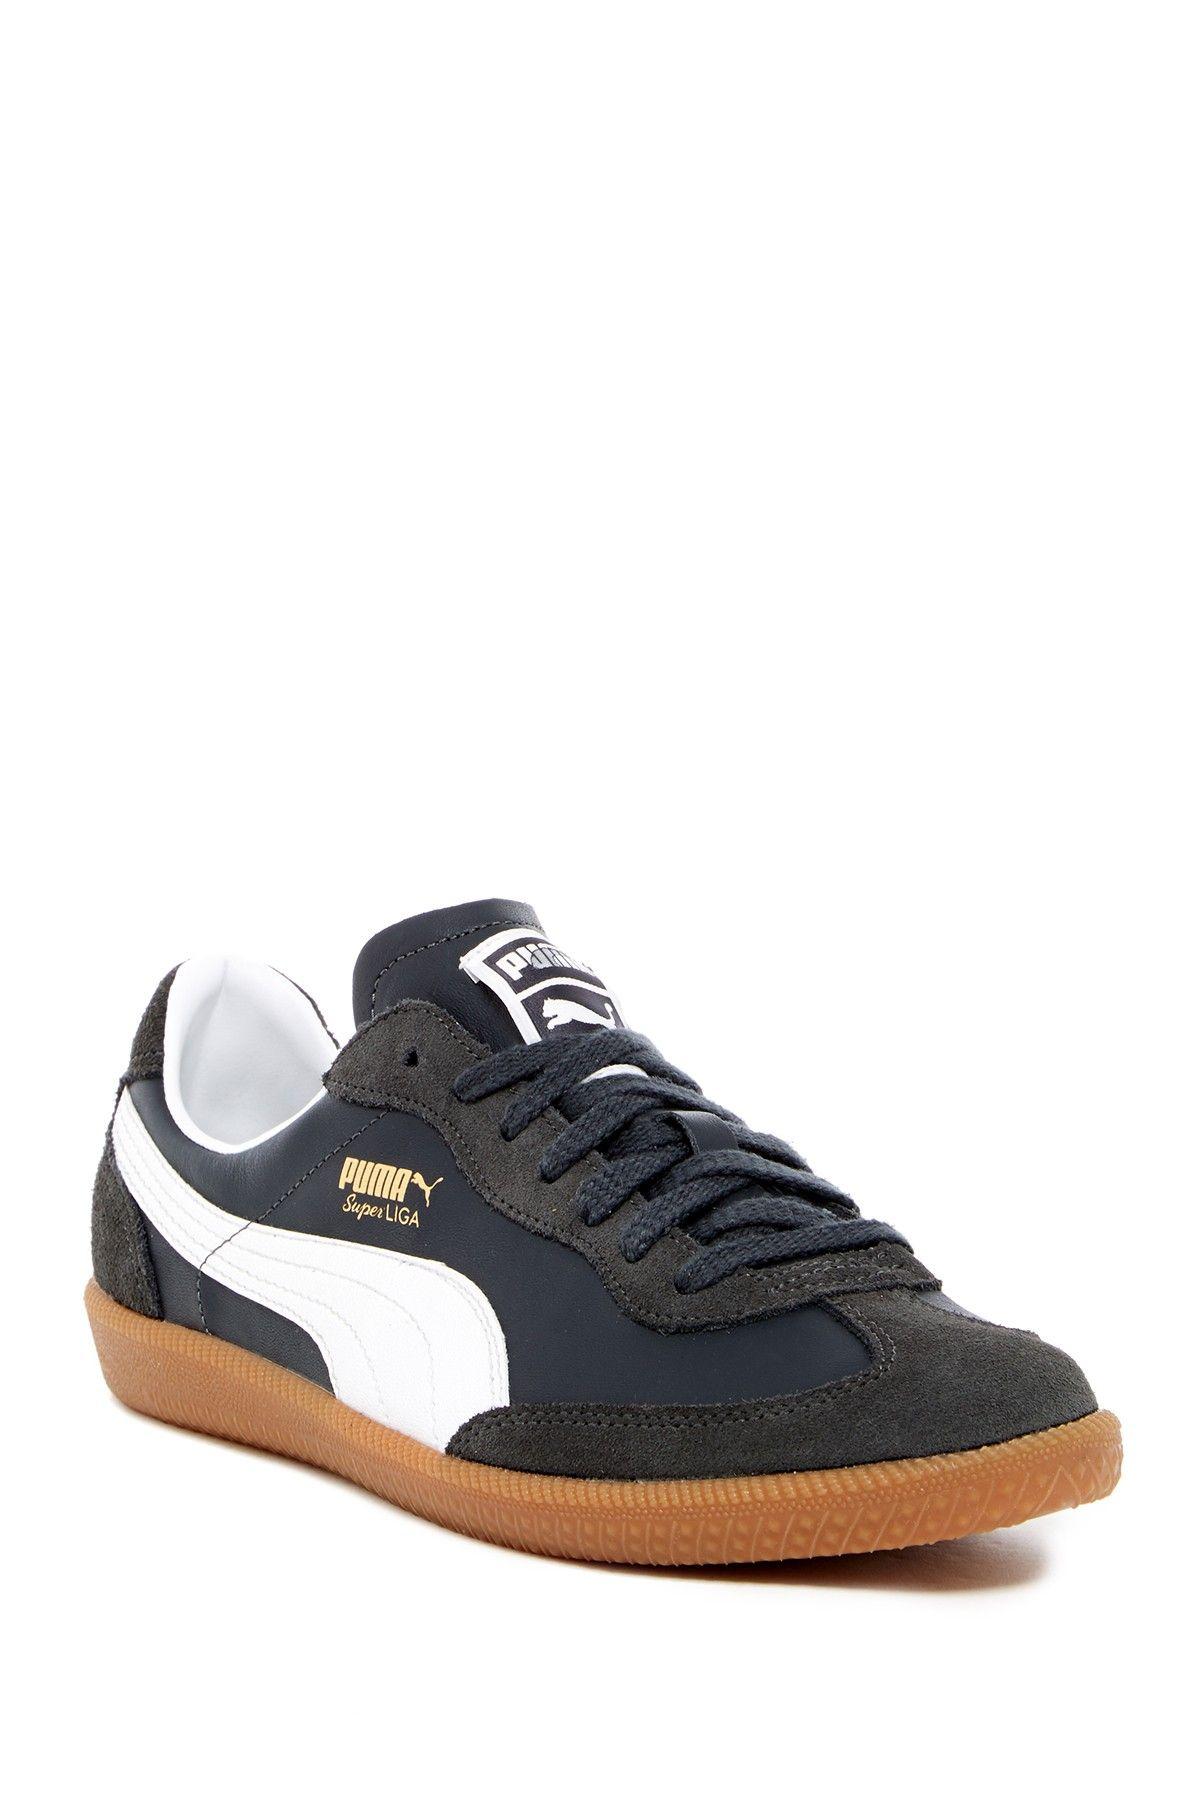 PUMA | Super Liga OG Retro Leather Sneaker in 2020